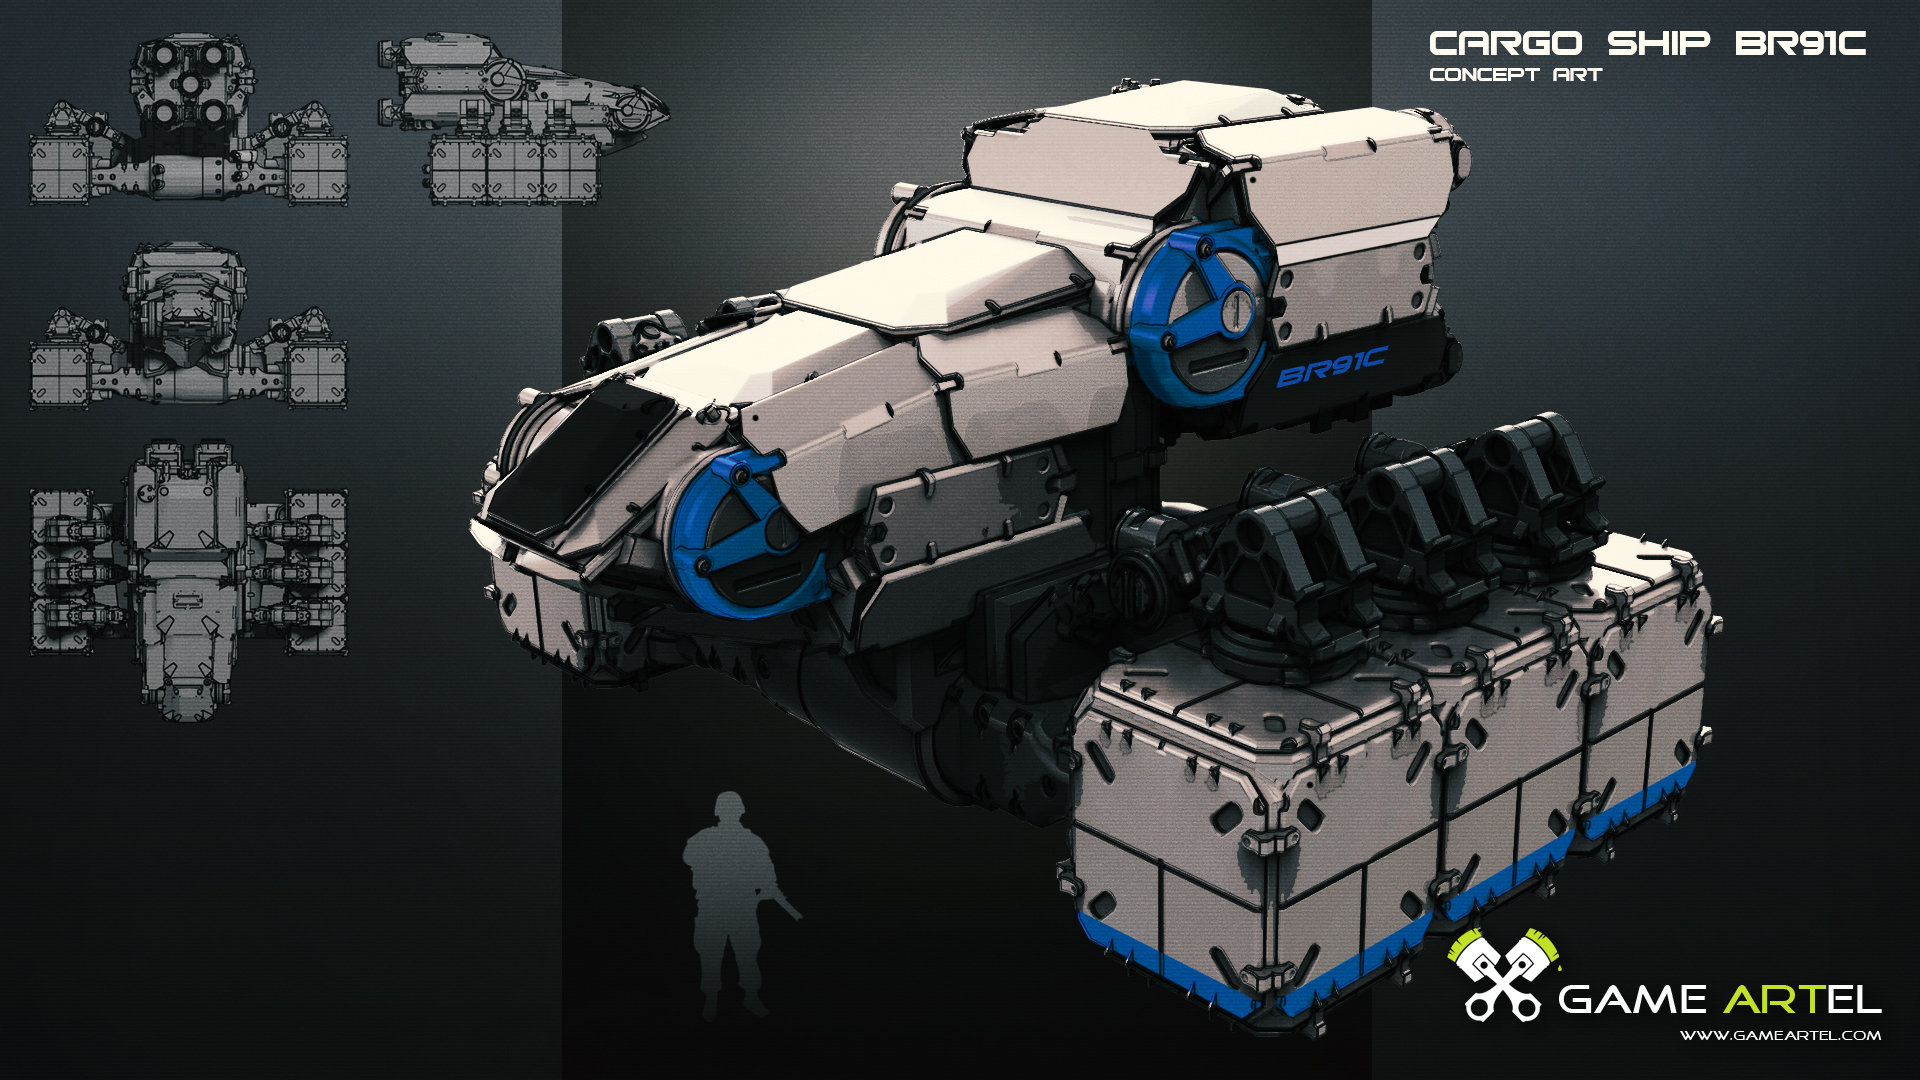 Space Cargo Ship Concept Art_GYOftbKaQ2VOXq2rxjJDS3xGRttpJ4AFYNGdFh4ylAo on Spaceship Deck Plans